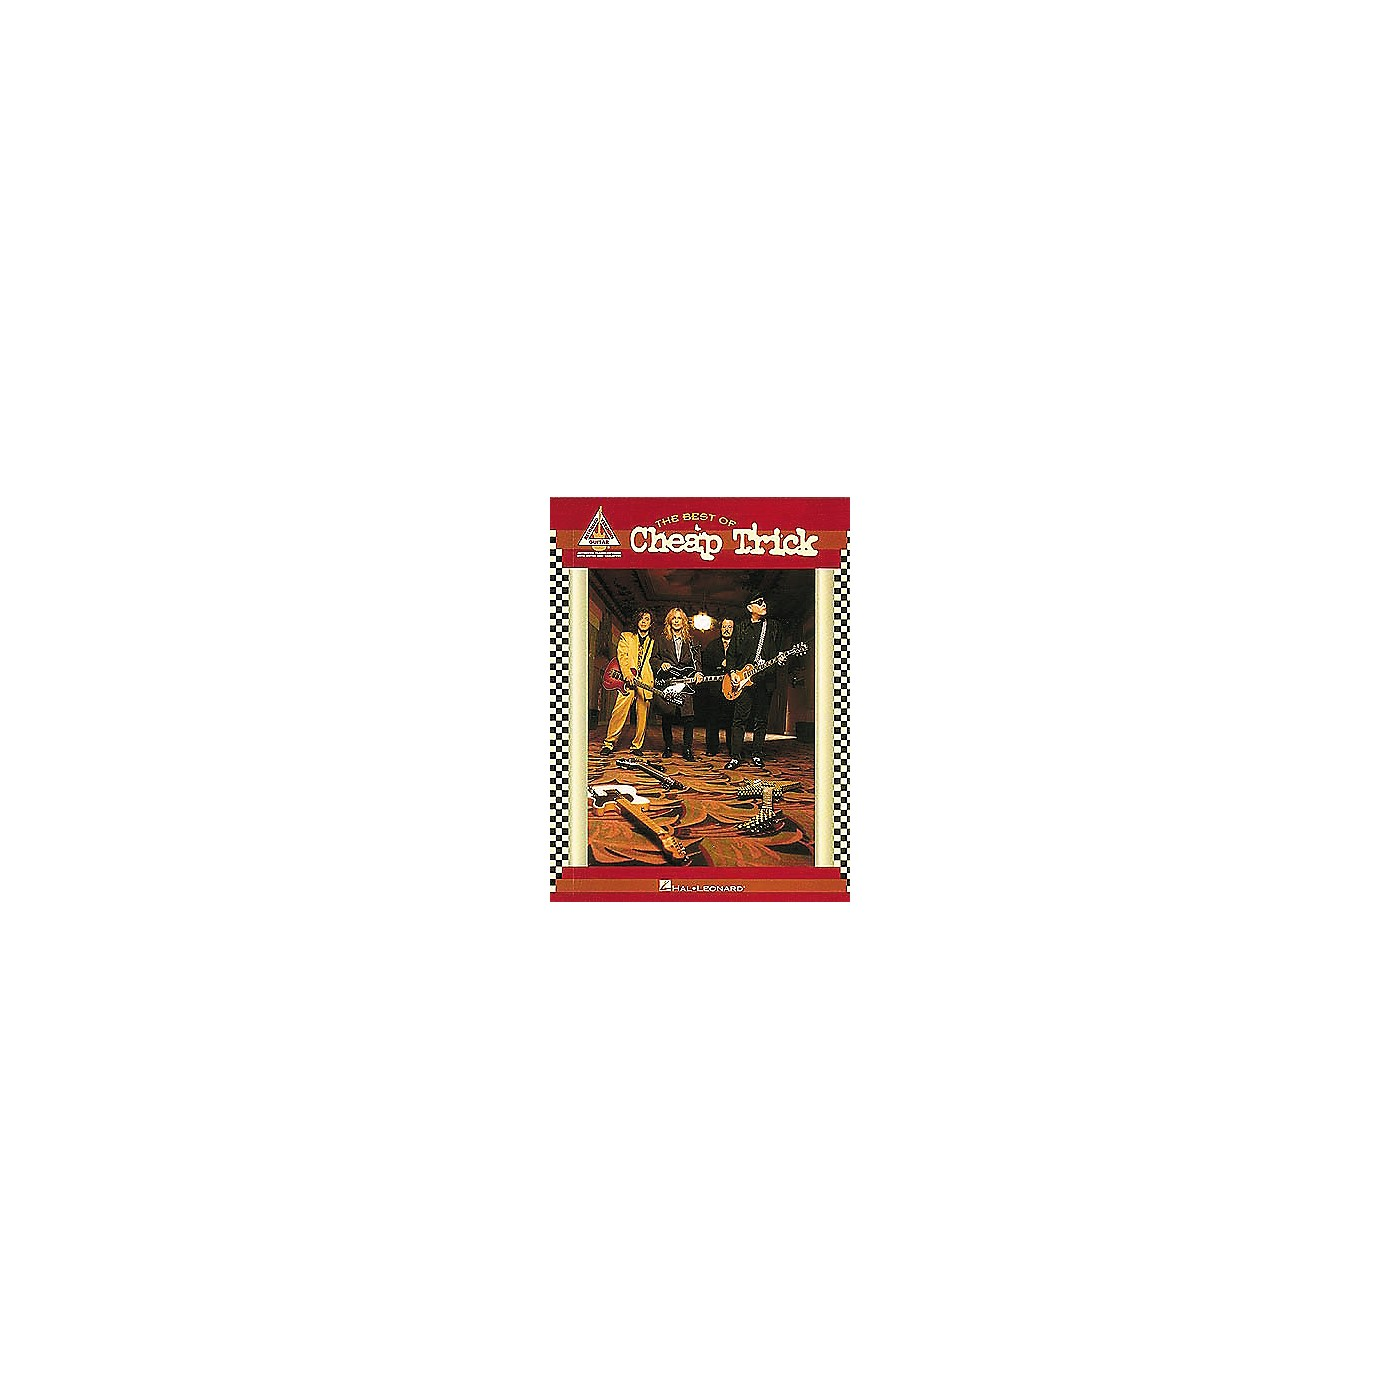 Hal Leonard The Best of Cheap Trick Guitar Tab Book thumbnail